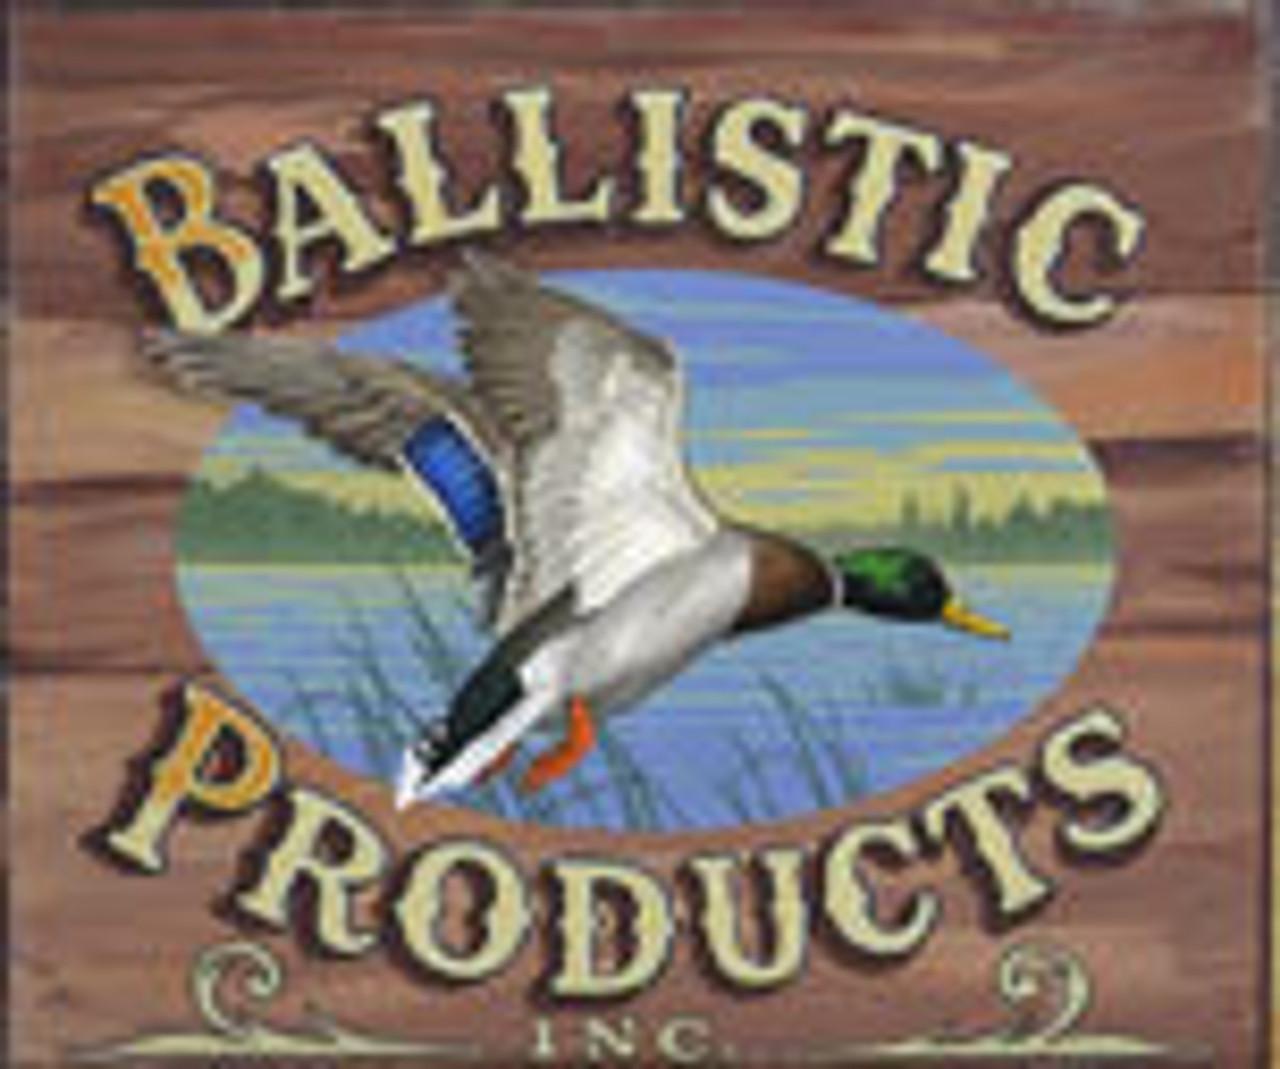 Ballistics Products